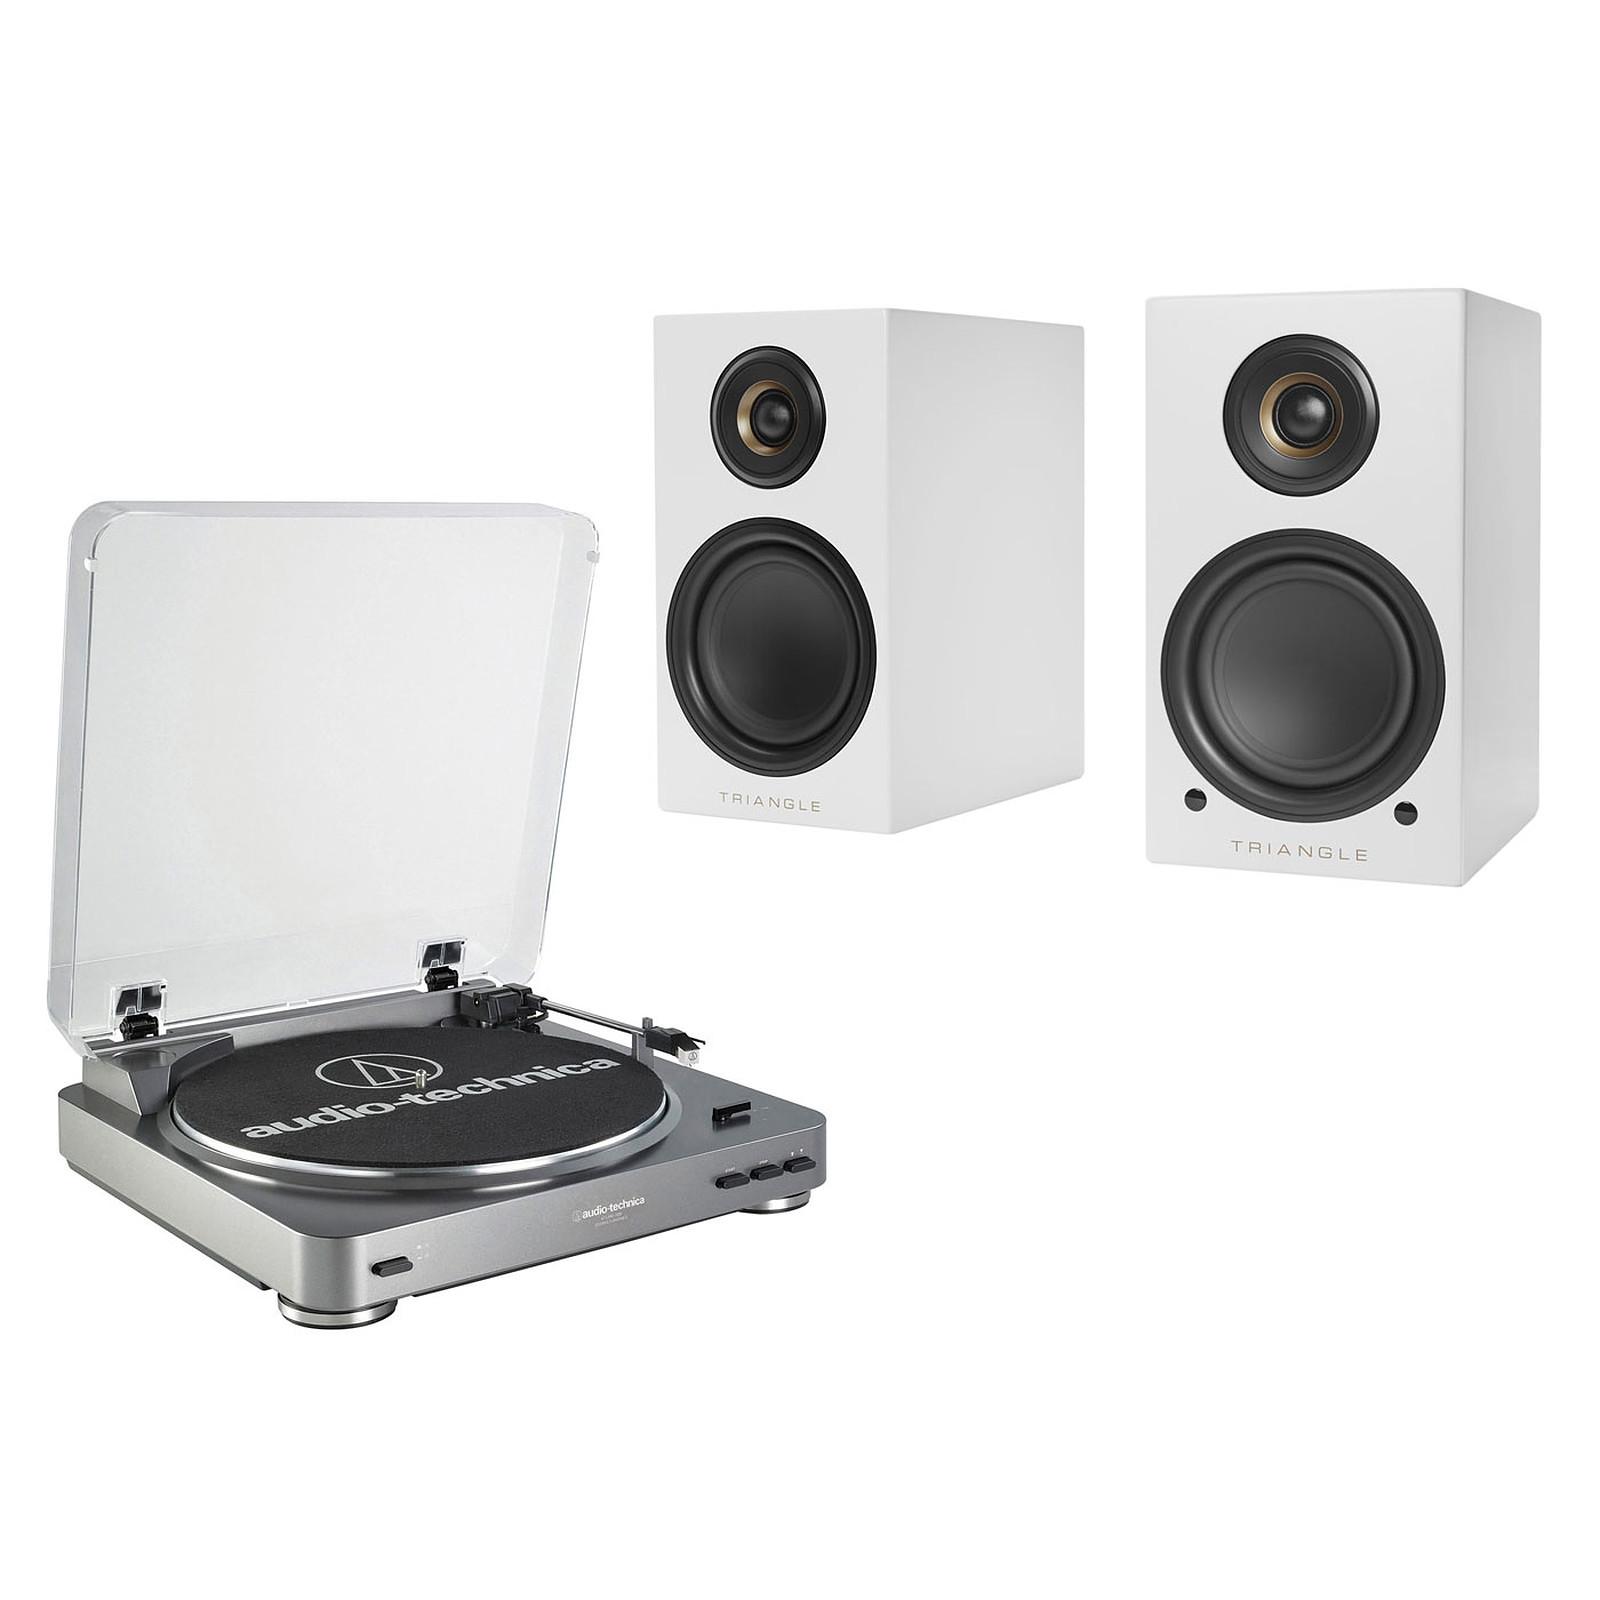 Audio-Technica AT-LP60USB + Triangle Elara LN01A Blanc mat